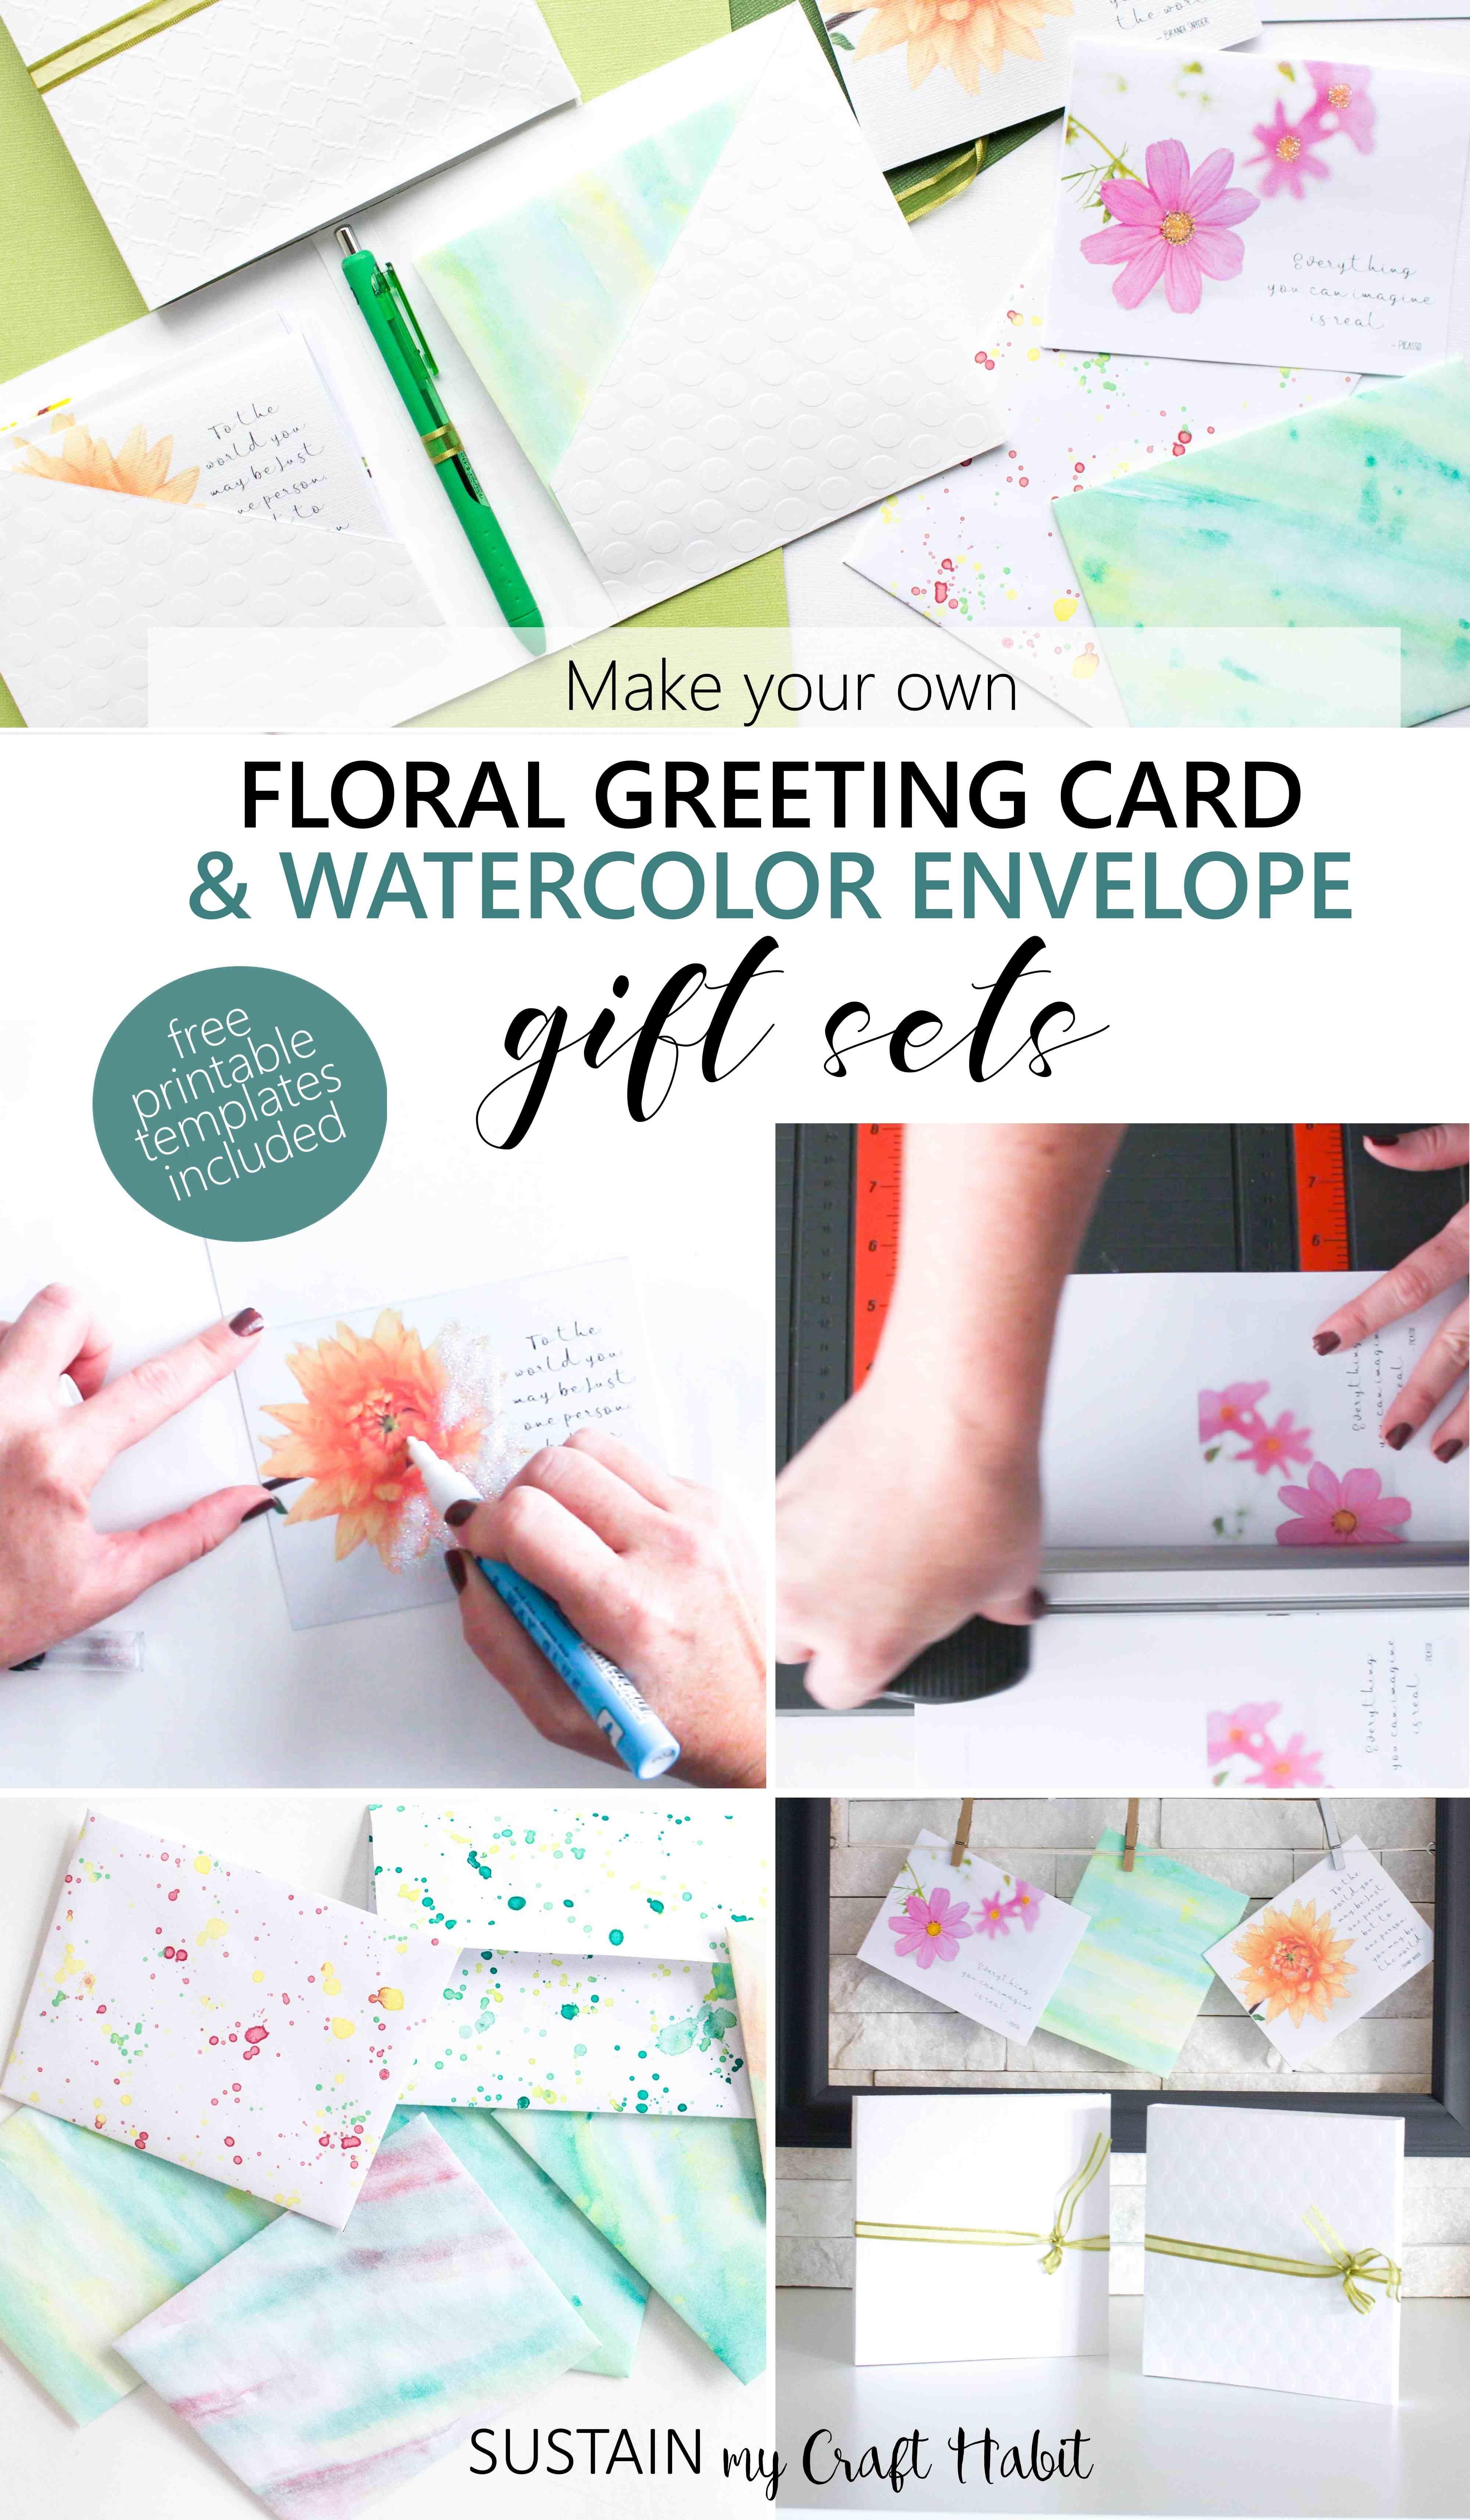 Card Making Gift Ideas Part - 44: Greeting Card Making | DIY Gift Idea | Create Greeting Card Gift Sets |  Video Tutorials